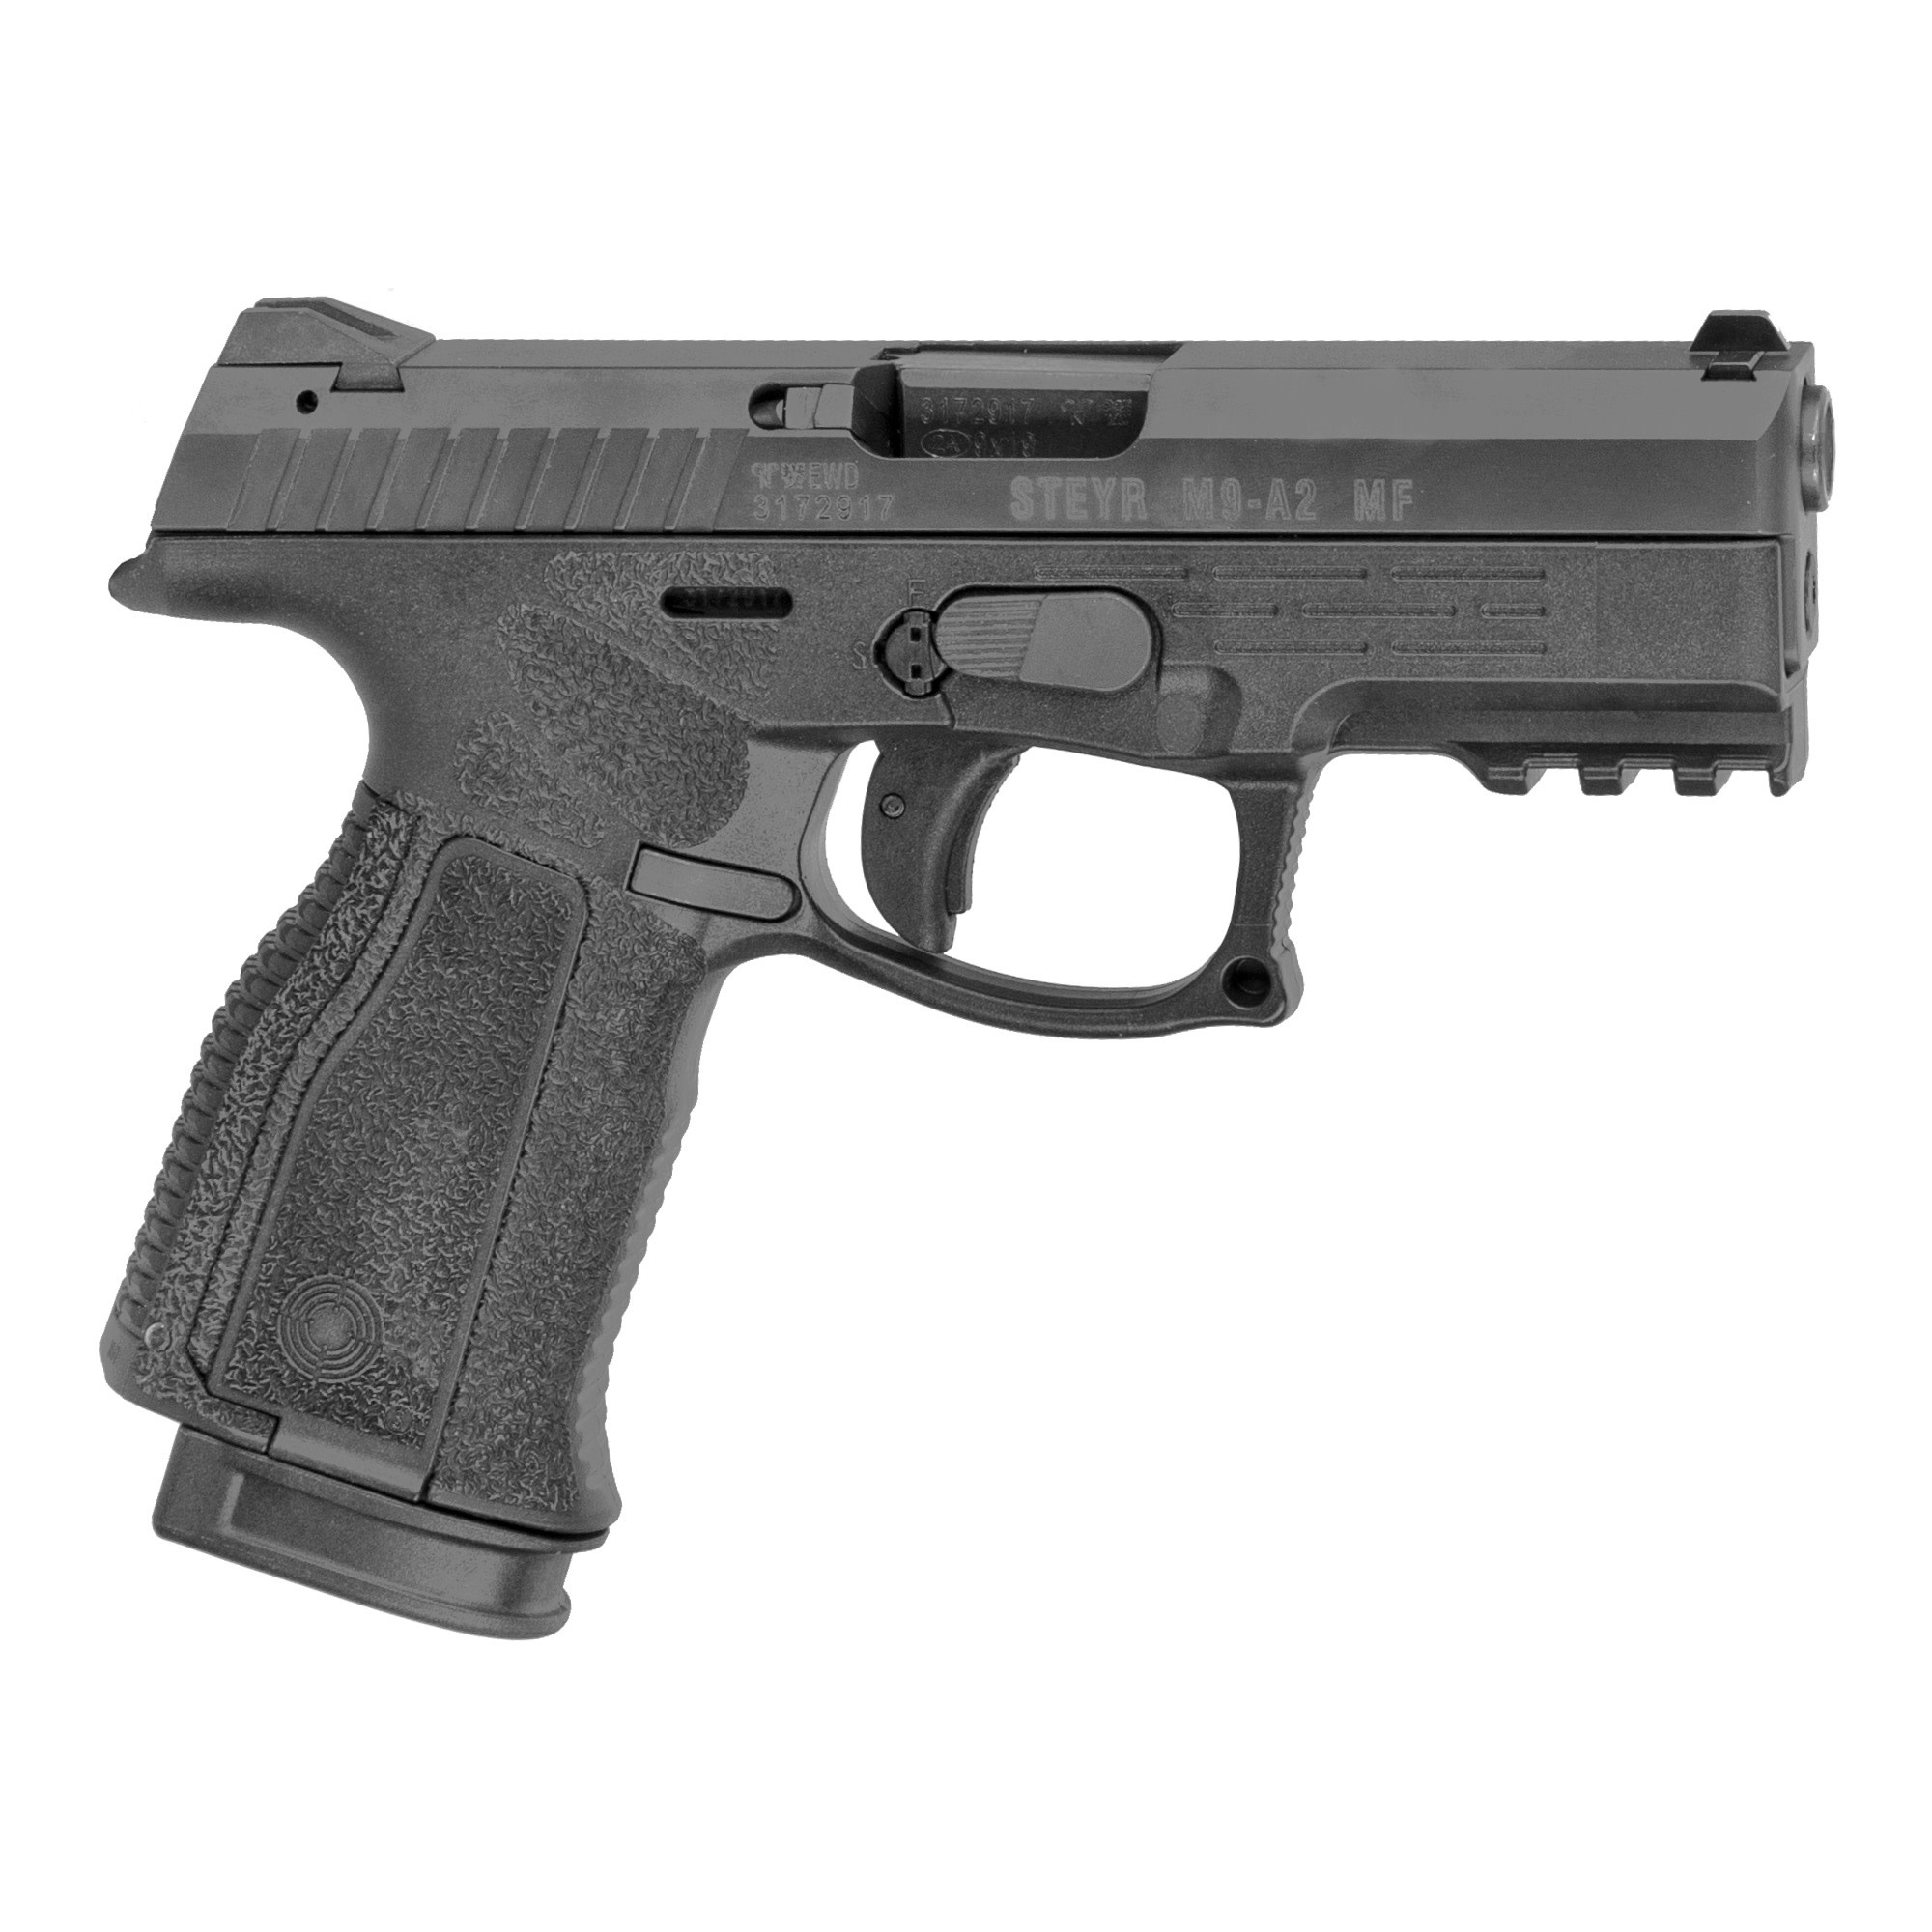 "Steyr M9-A2 MF 9mm, 4"", 17+1 Black"